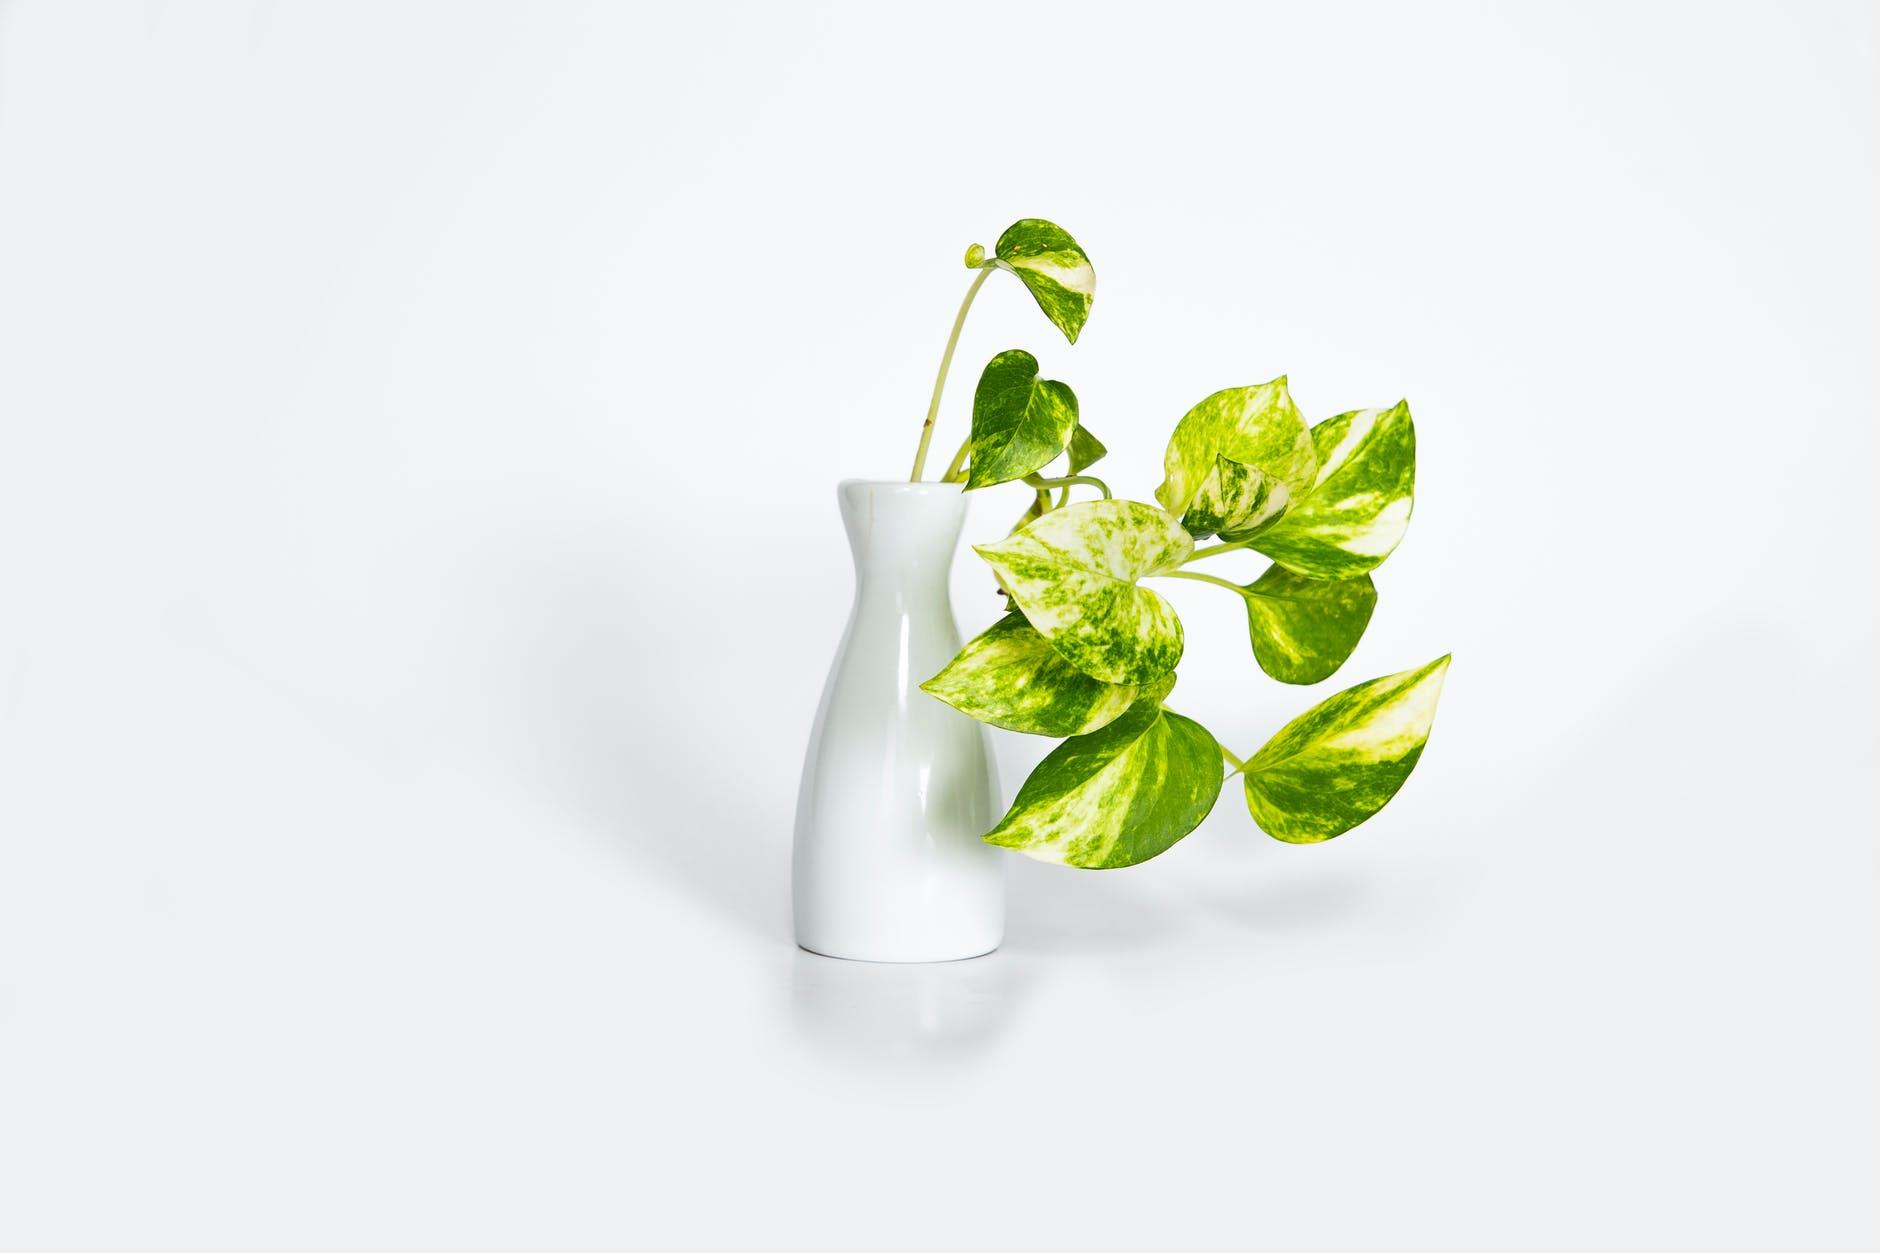 BEST INDOOR PLANTS WITH MINIMAL MAINTENANCE